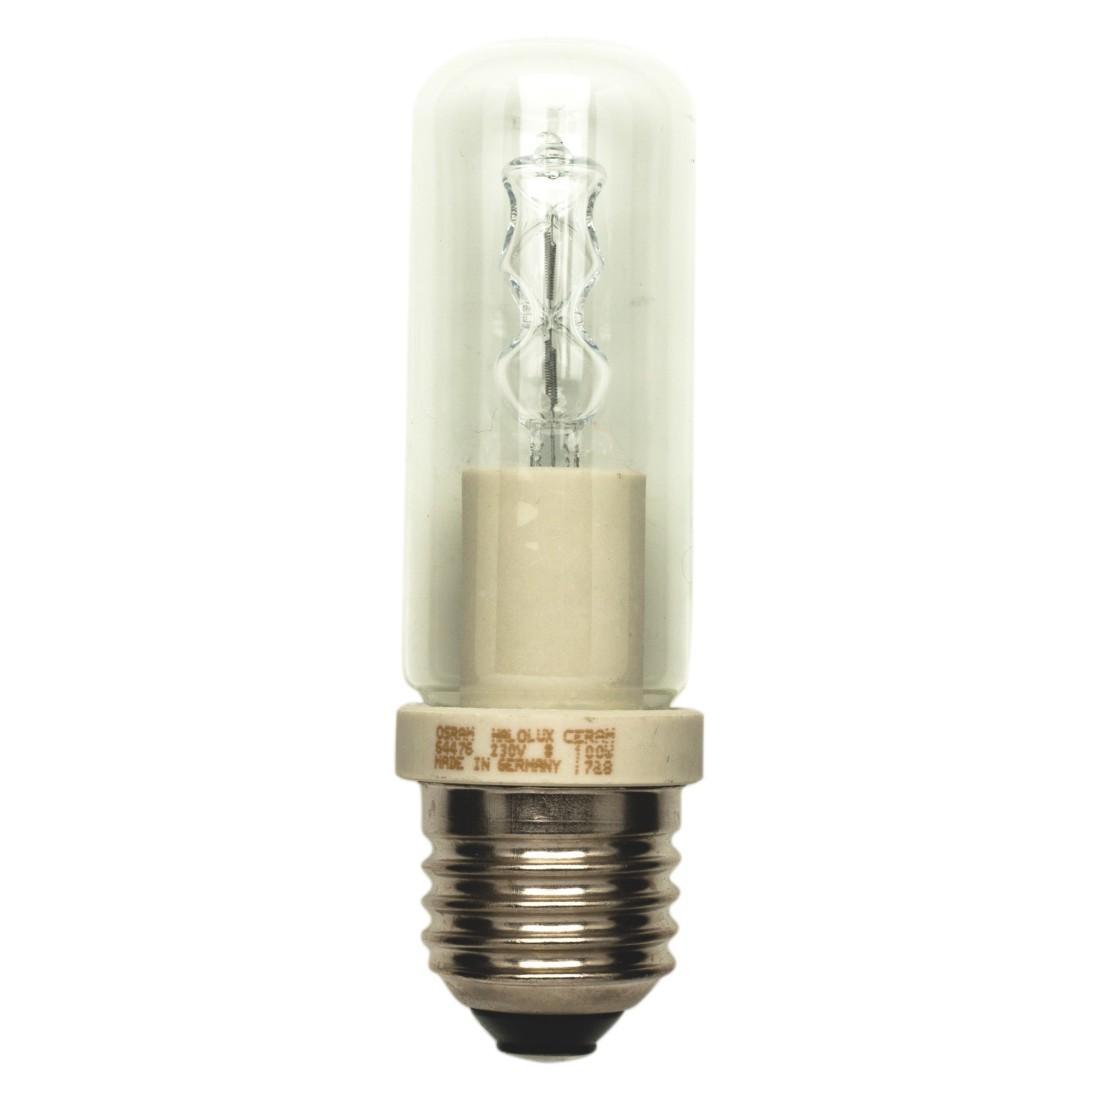 Halogen-Retrofitlampe E27 100 W Kolben klar ● Klarglas Transparent- Mega Licht